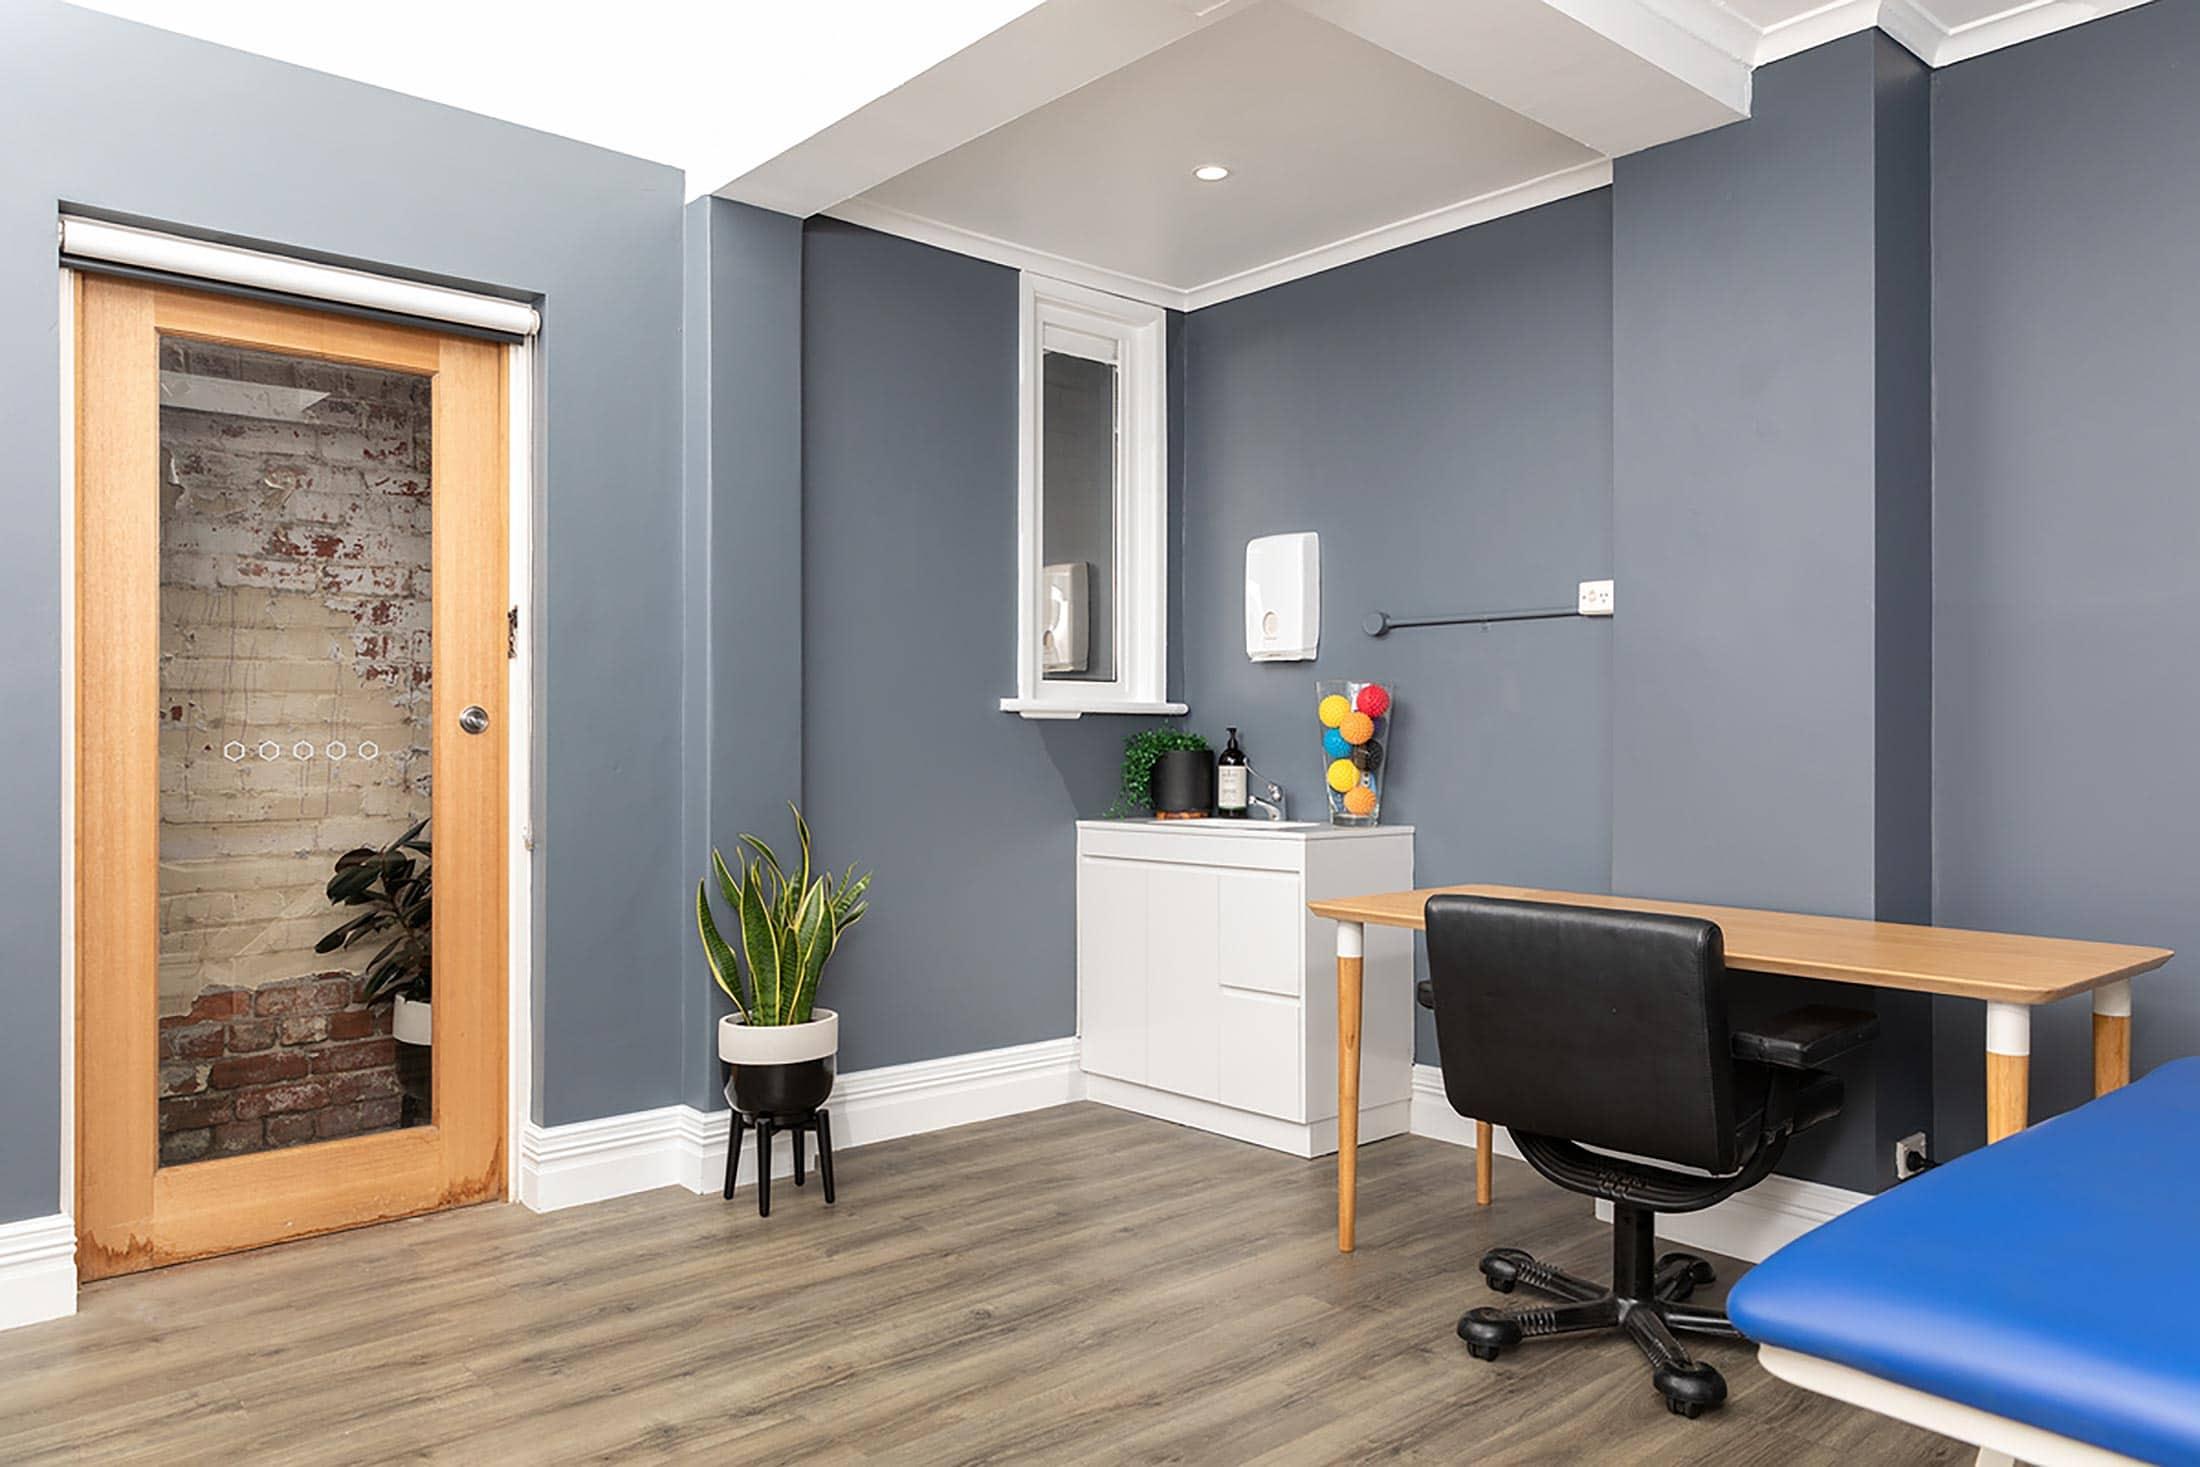 Nicholson Health Chiro Room